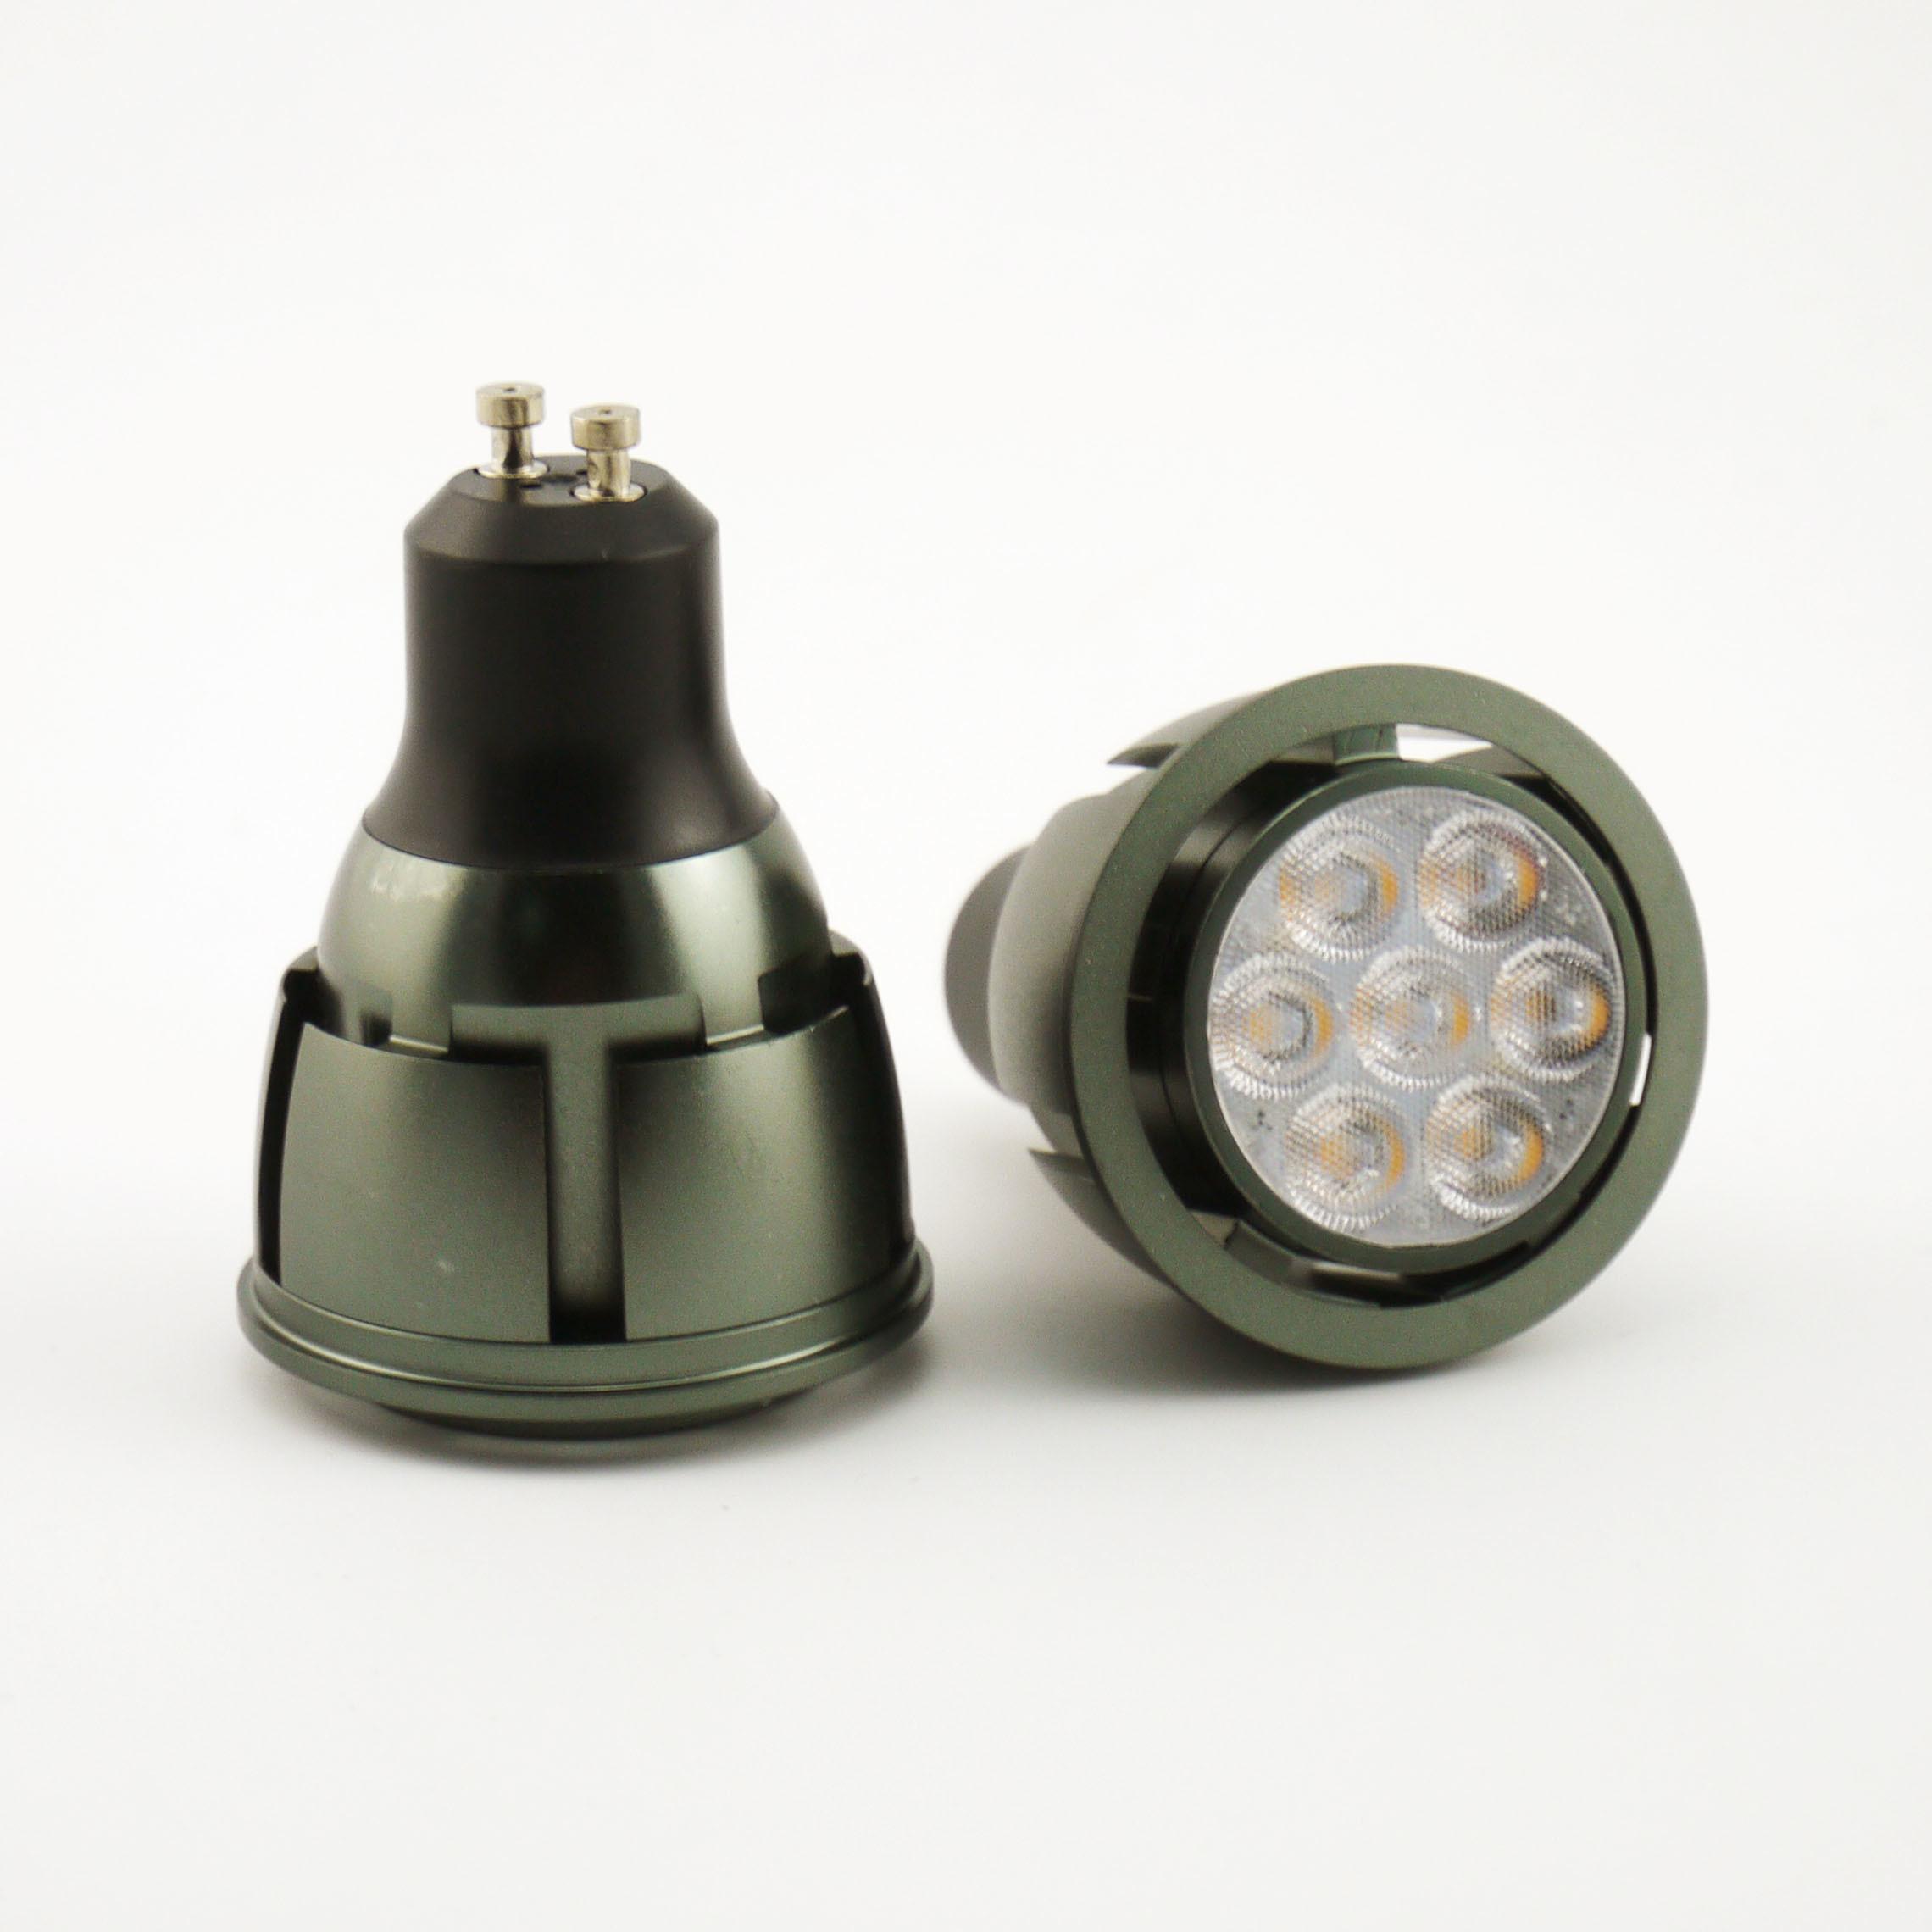 Aluminum 7W SMD LED Recessed Downlight GU10 Bulb